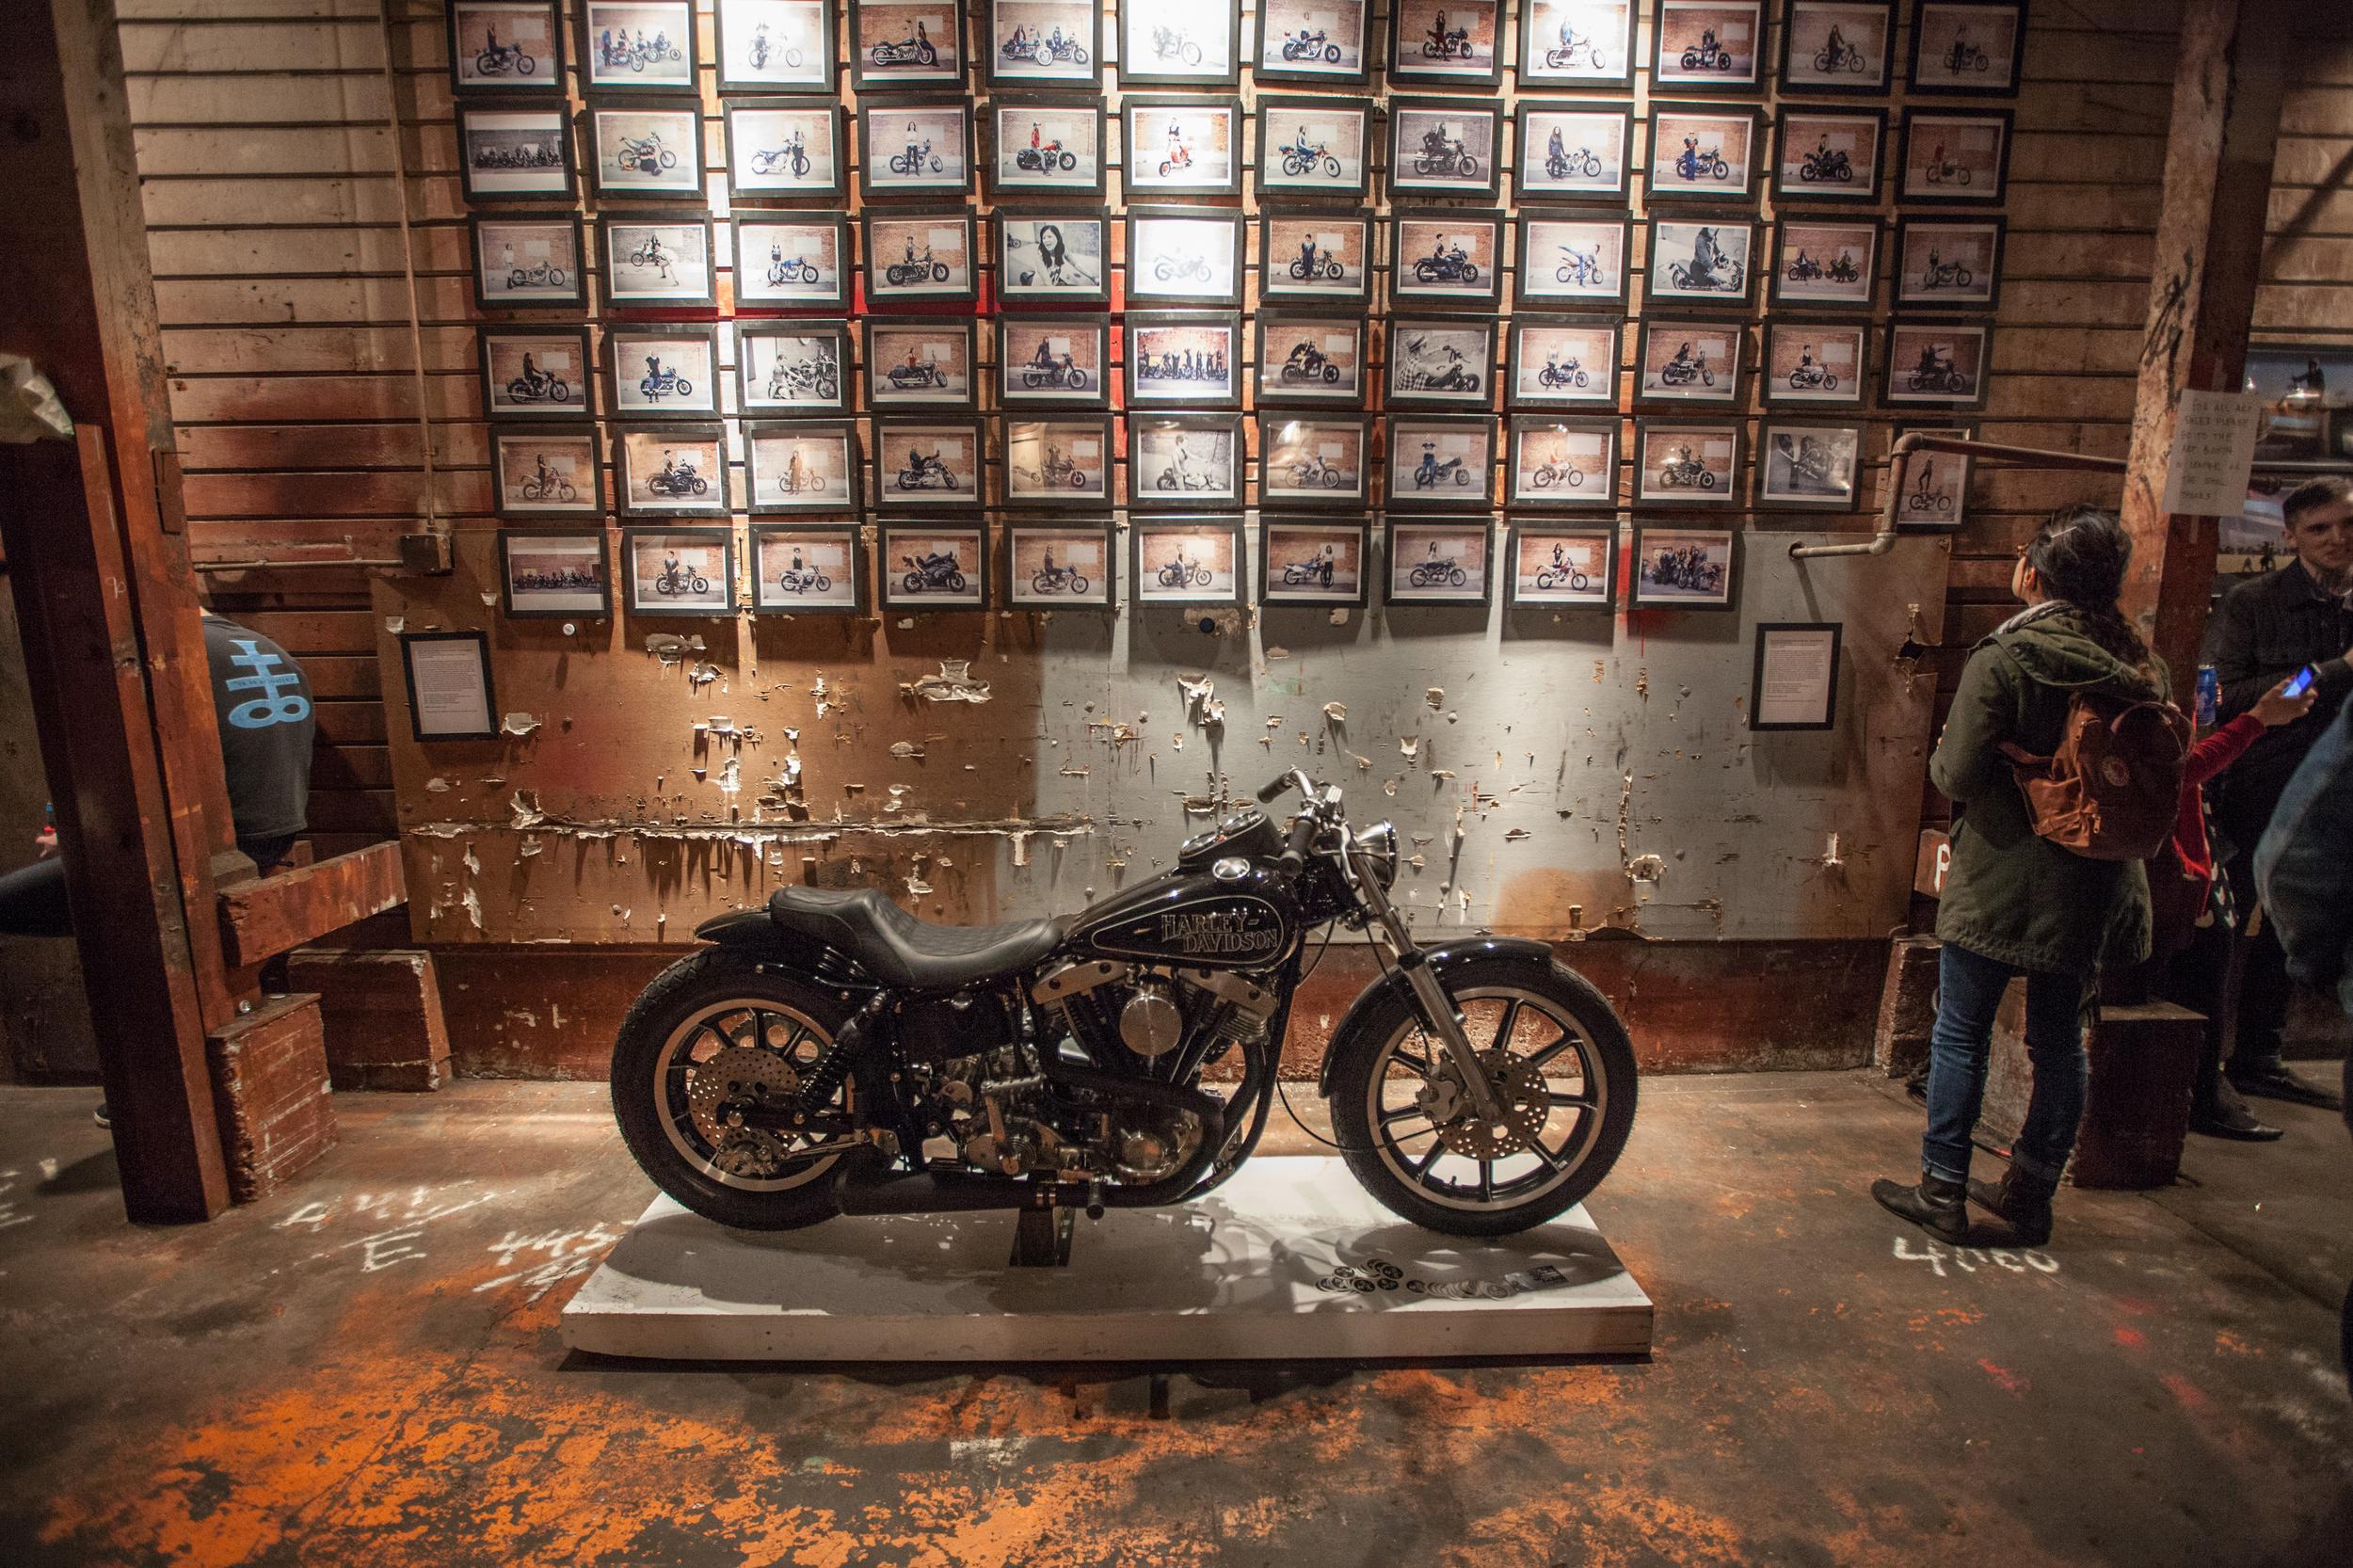 02-14-15 The 1 Moto Show - 1_-37-2.jpg